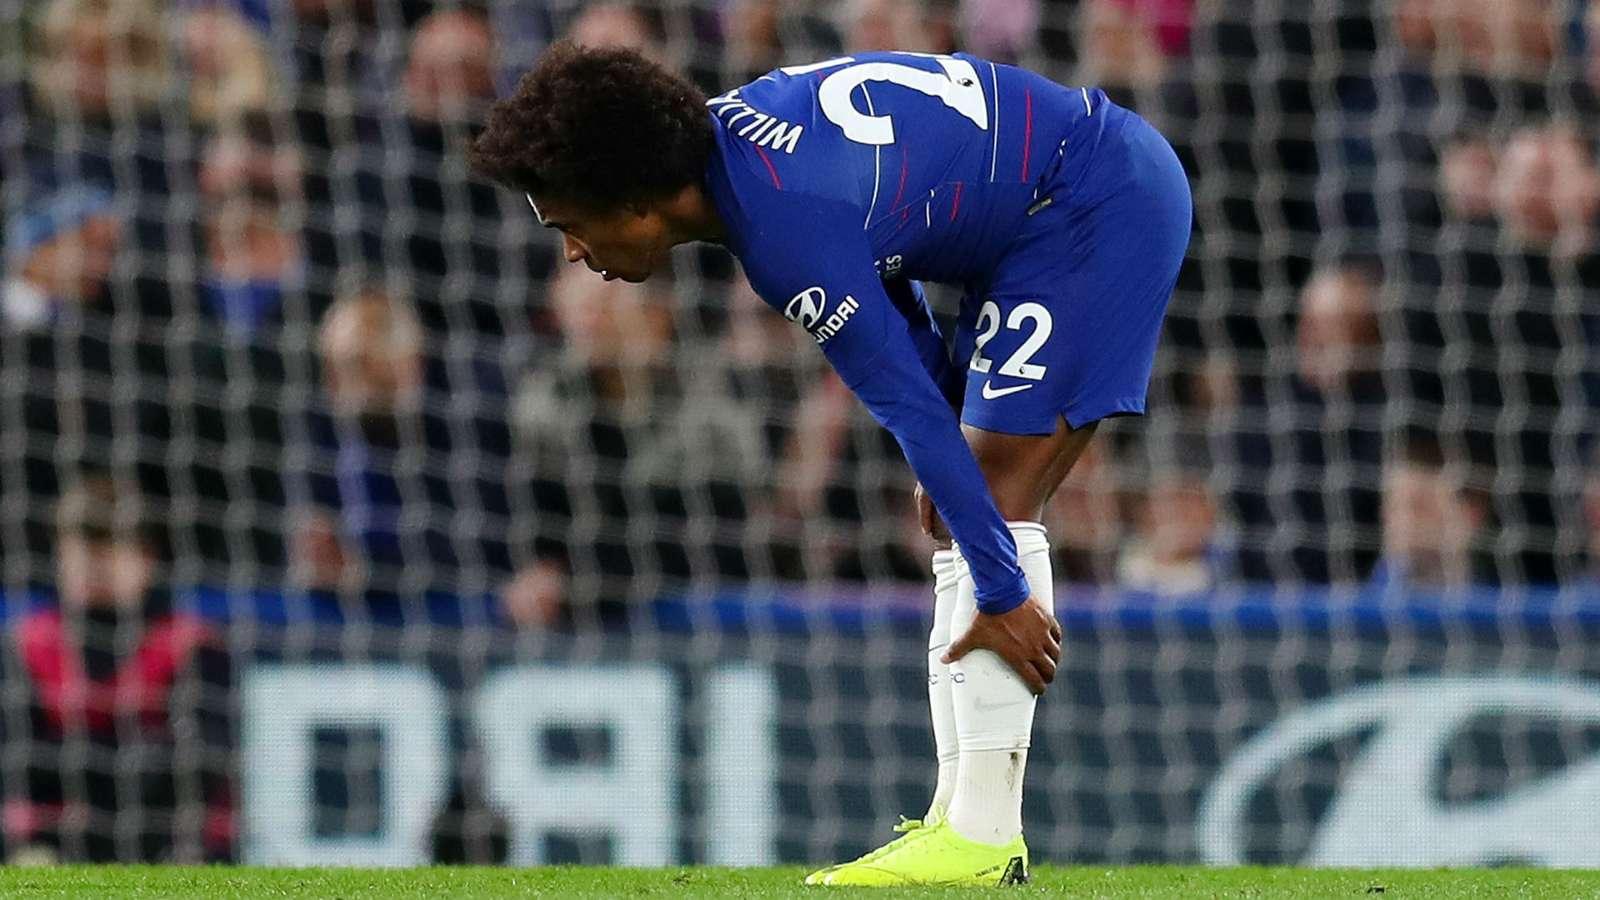 willian cropped 2bmlo0q1kb661wya12gfau1je - Watch: Chelsea vs Southampton 0-0: Premier League Highlights [Video]